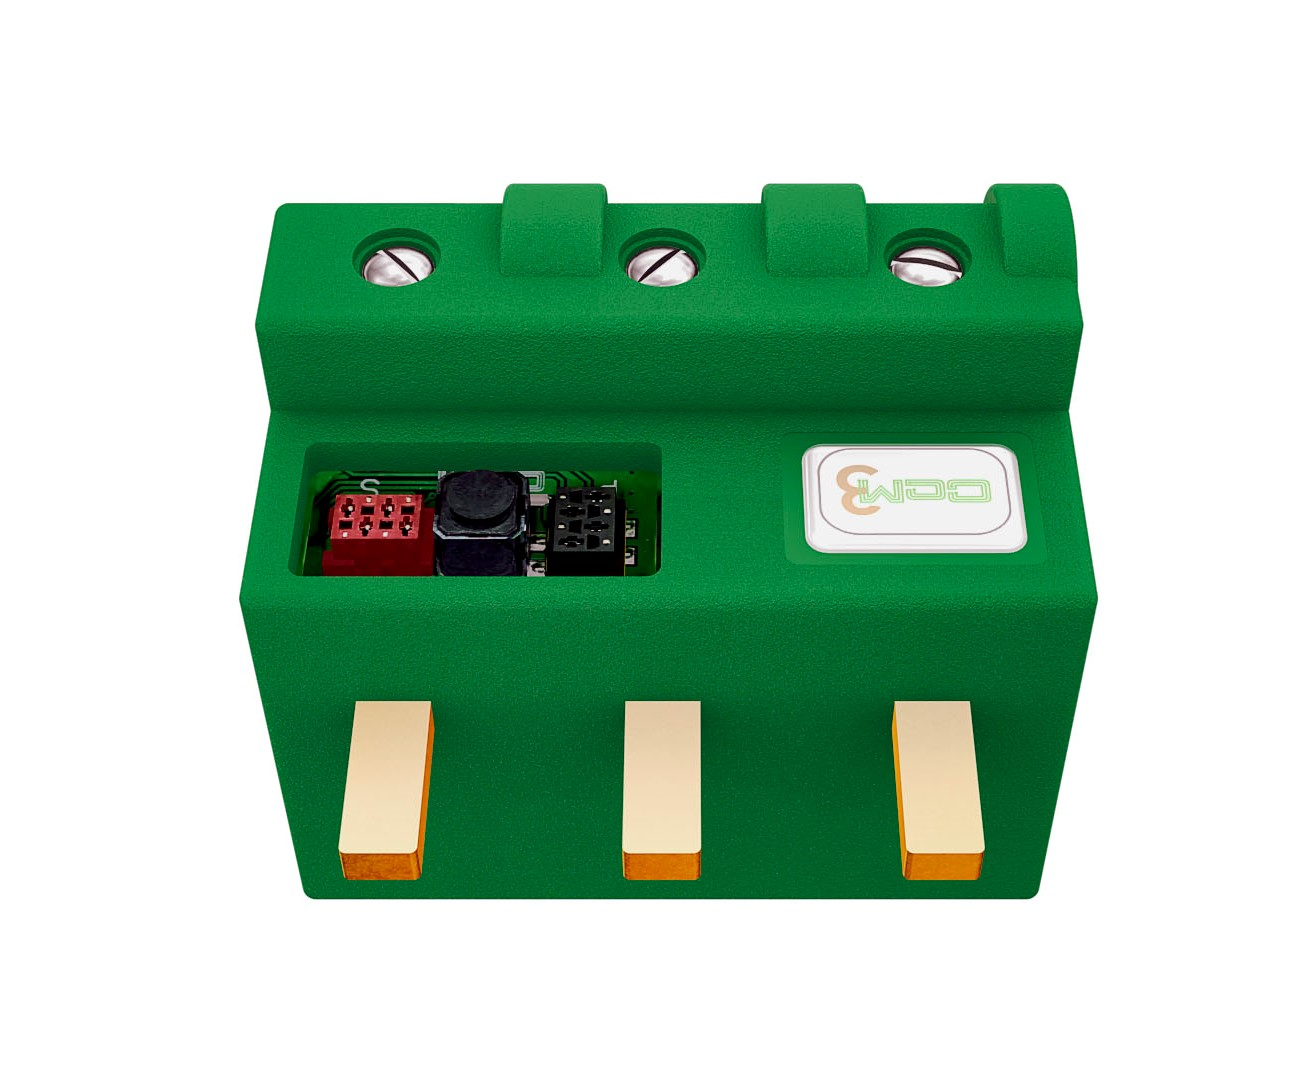 Smart electricity meter CcM3